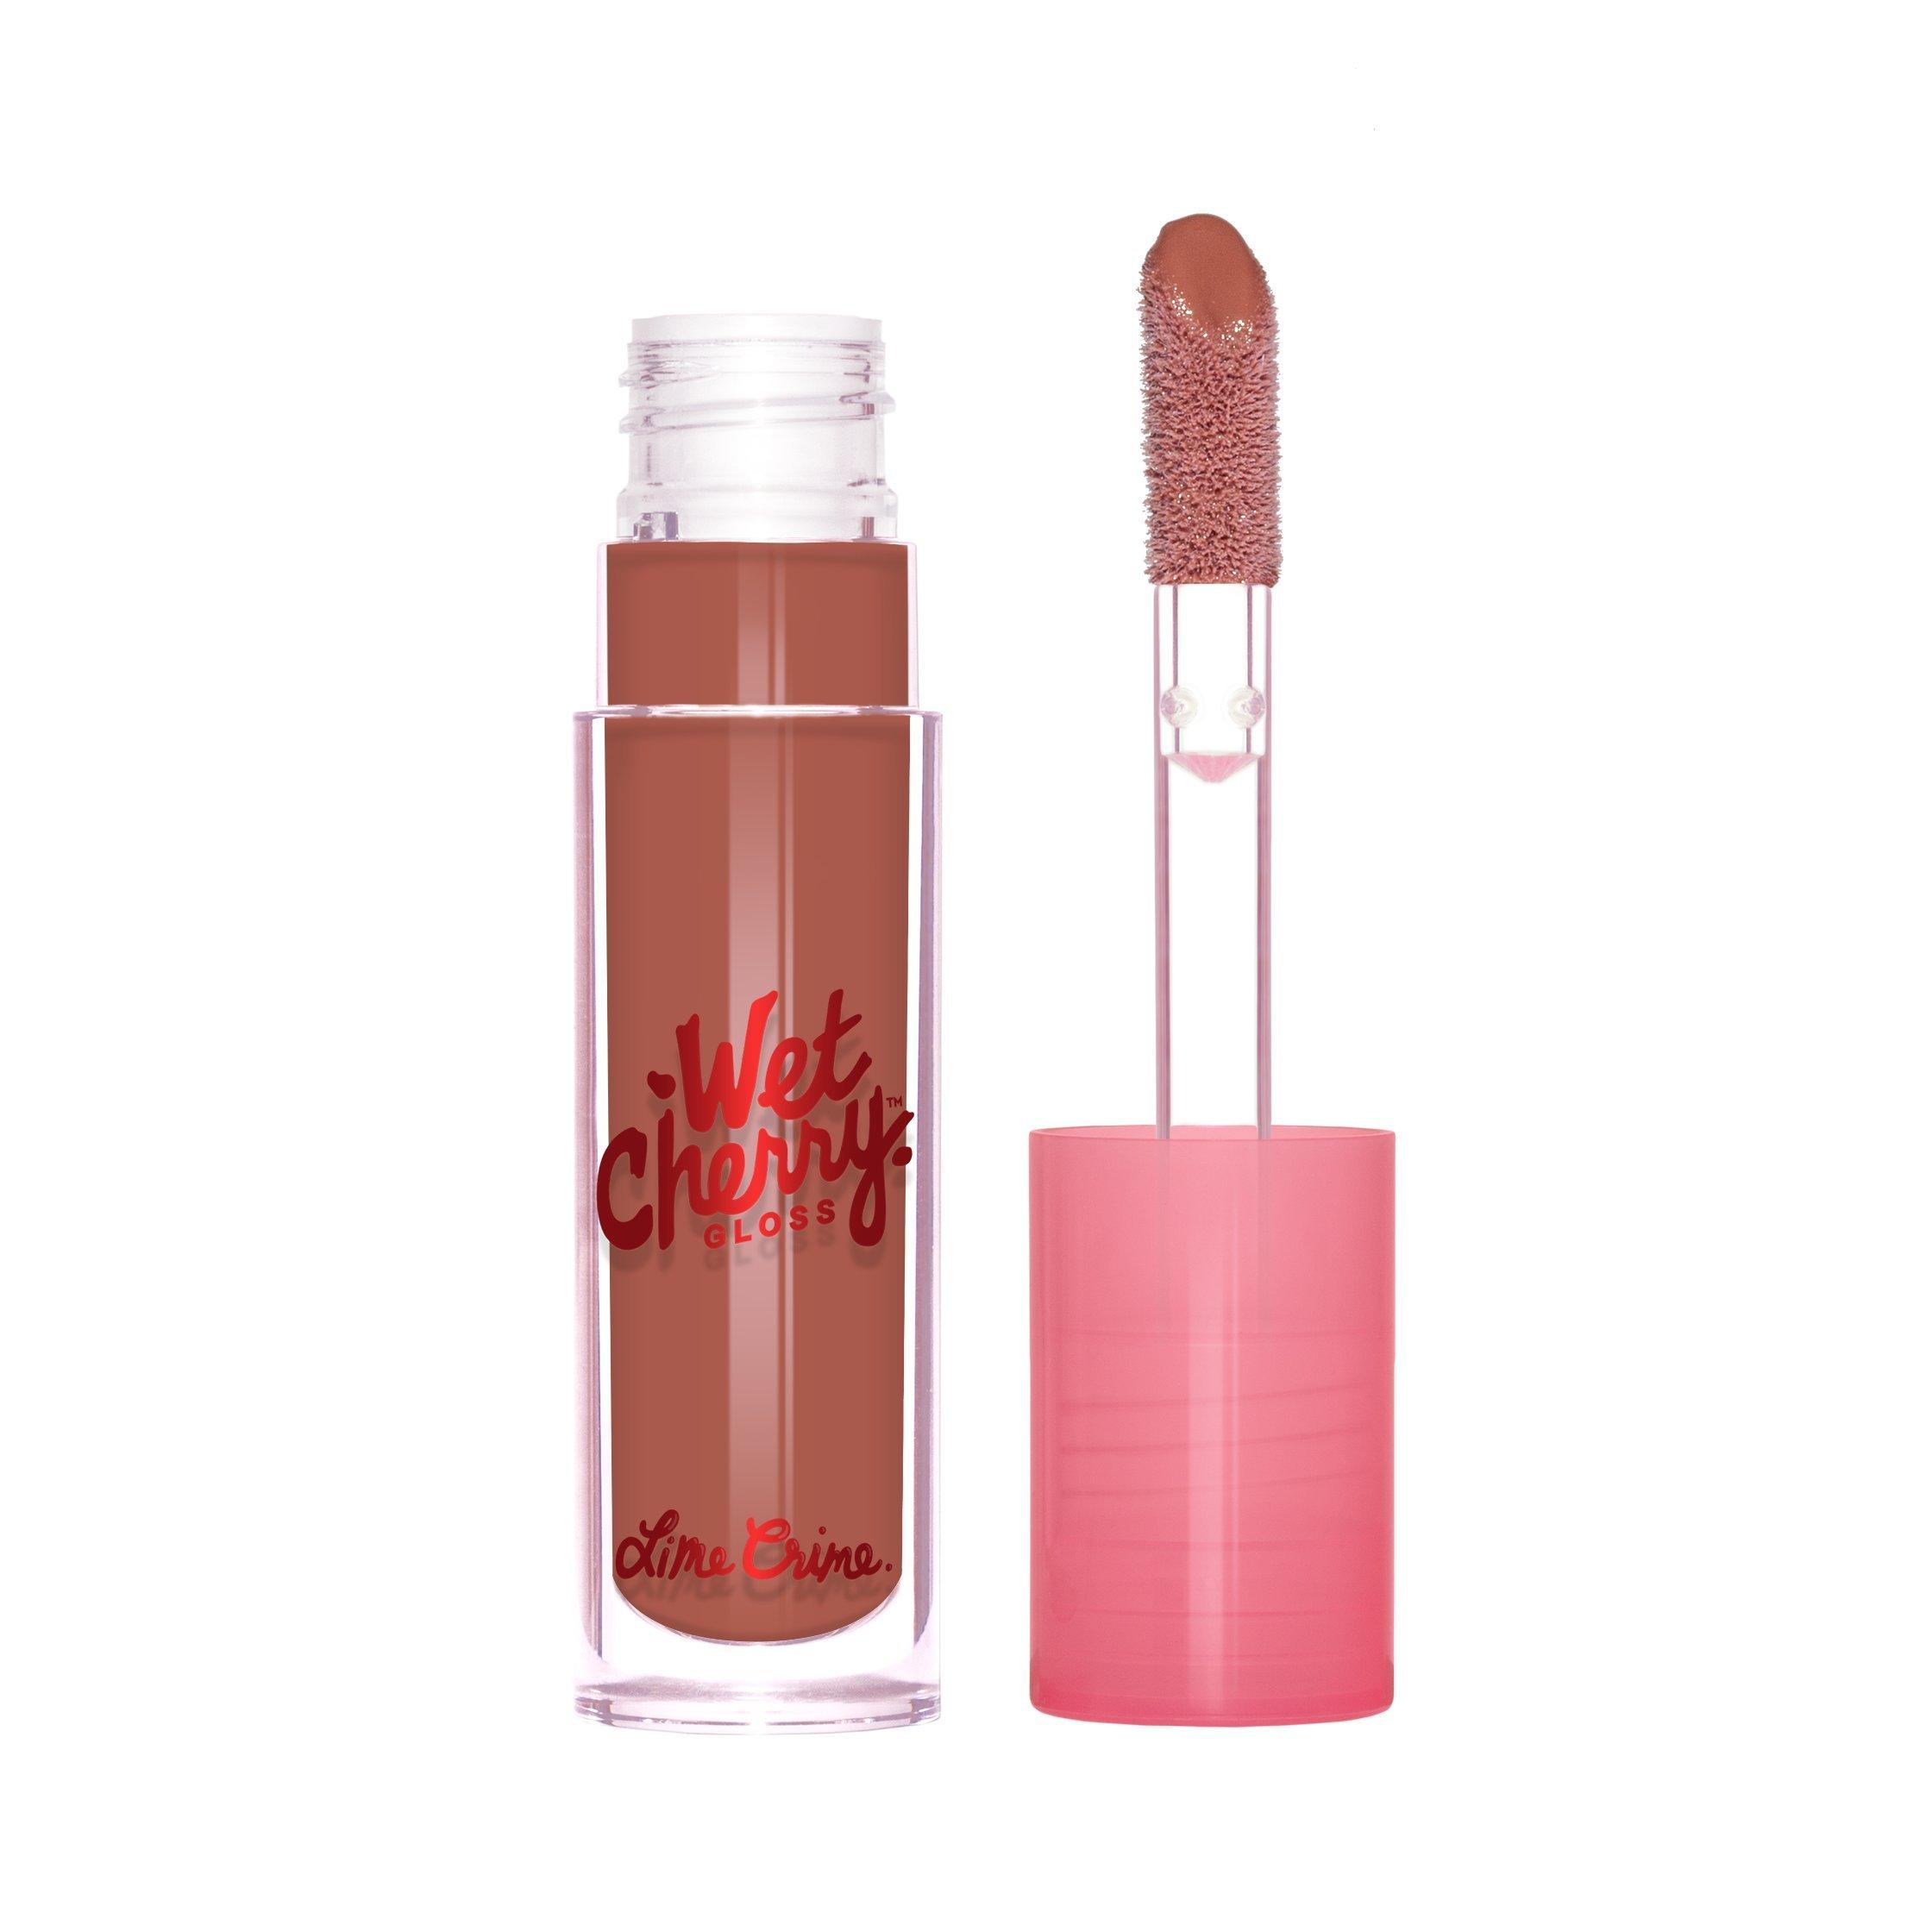 Lime Crime Wet Cherry Lip Gloss (BITTER CHERRY). High Shine, Non-Sticky Lip Gloss in Soft Brown-Nude. (0.1 fl oz / 2.96 ml)